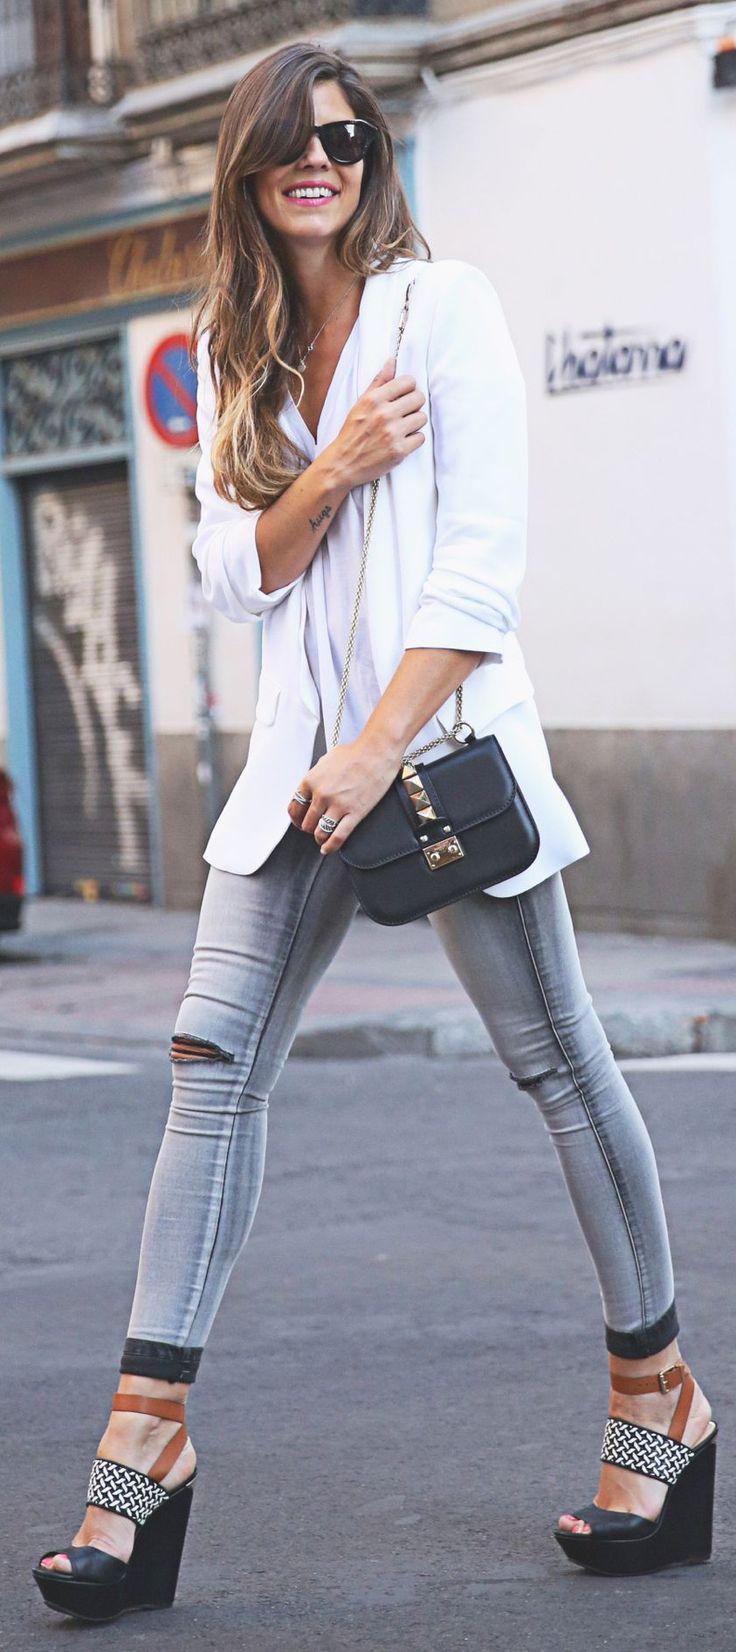 Buylevard (SS 15) Jeans + Zara Blazer & Top + Jessica Simpson Sandals + Valentino Bag